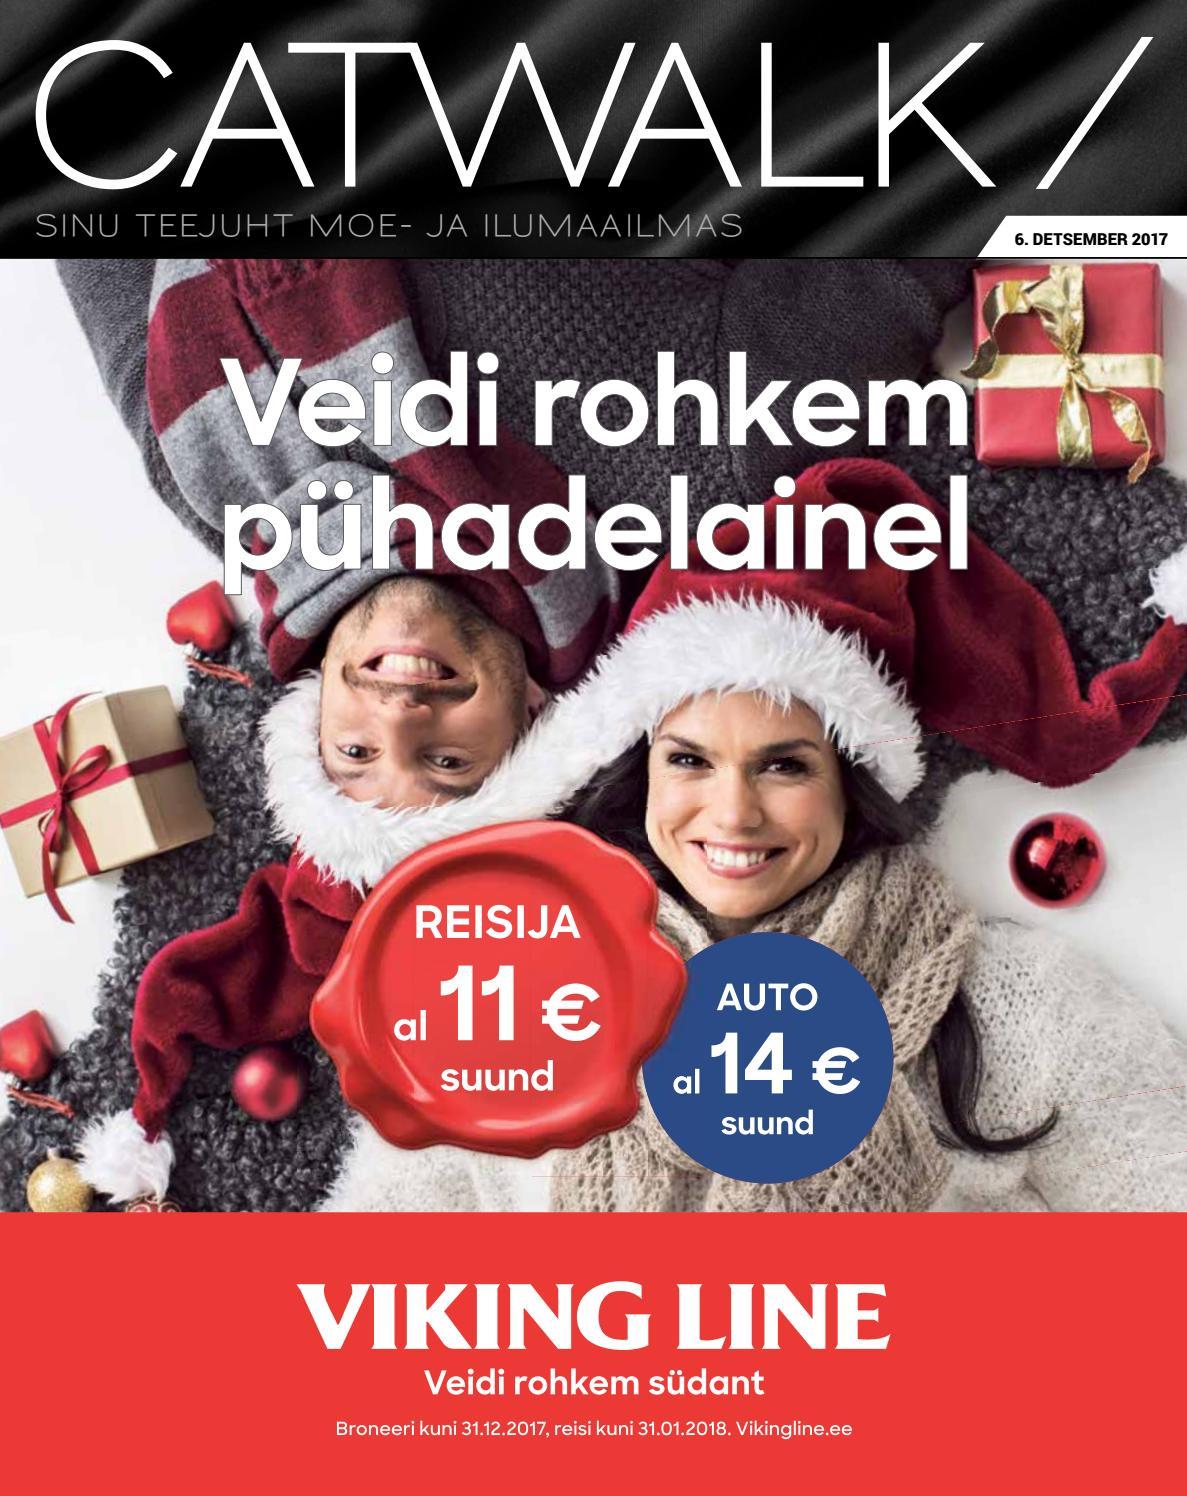 c967c76c3f7 Catwalk (detsember 2017) by AS Ekspress Meedia - issuu